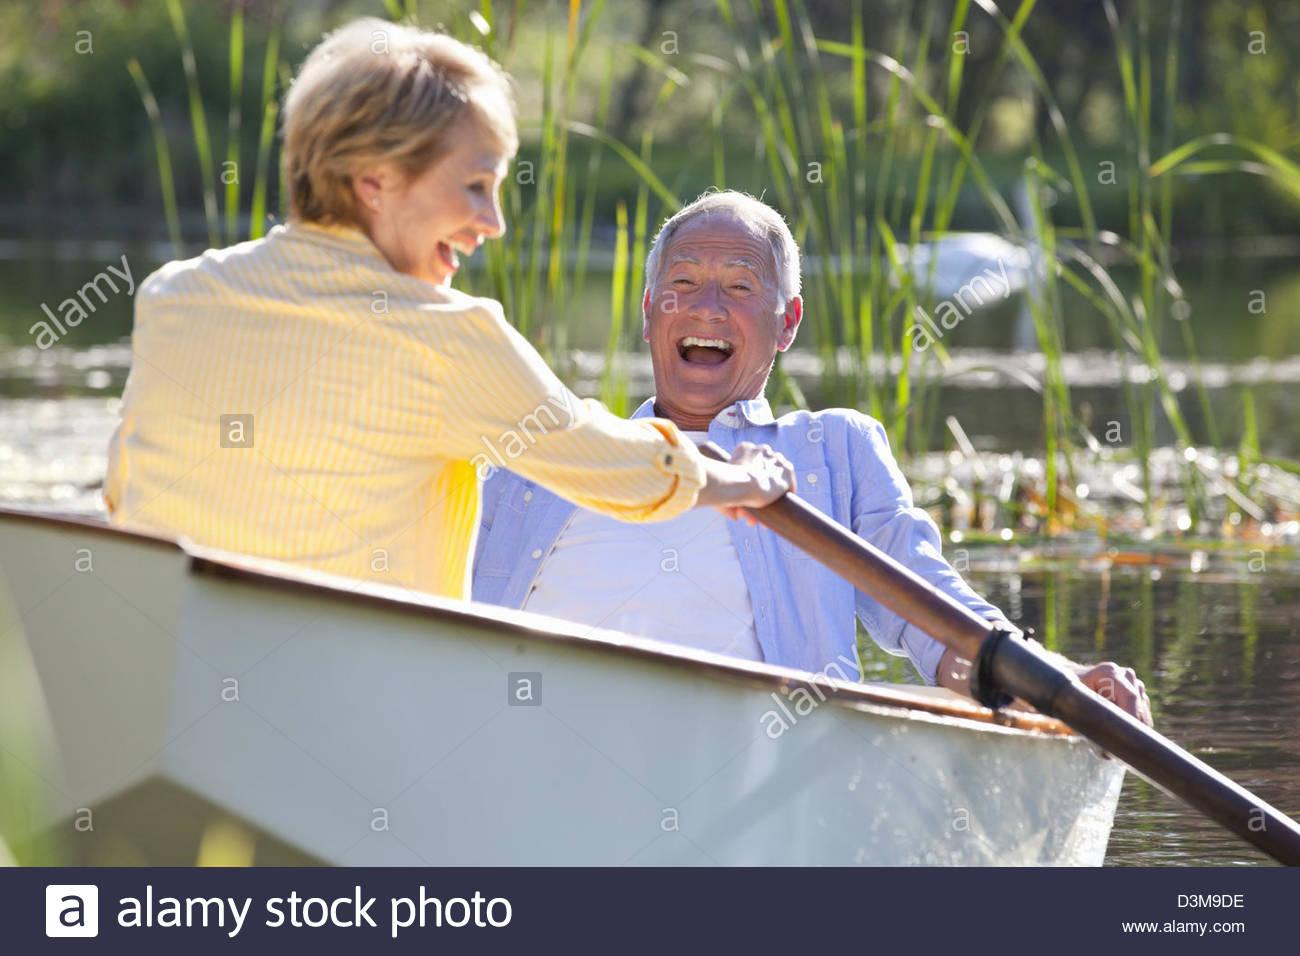 Smiling couple in rowboat on lake - Stock Image